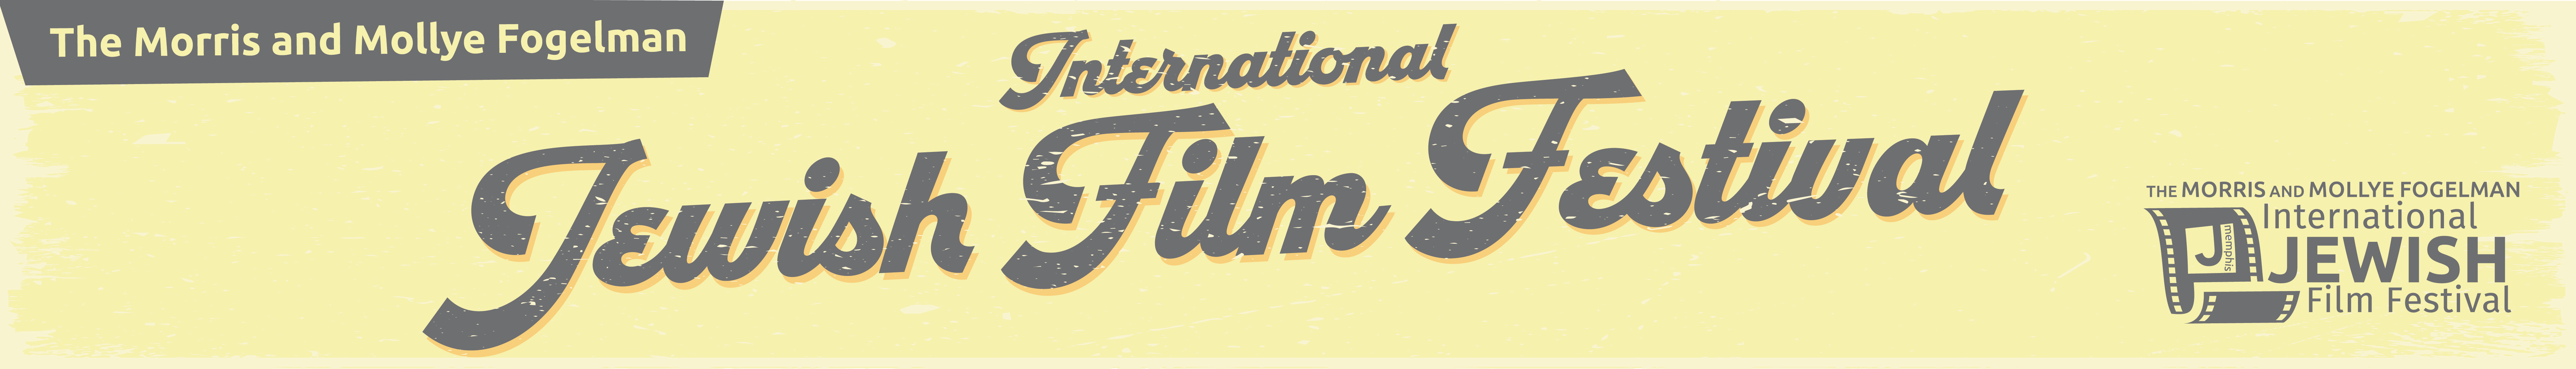 Morris & Mollye Fogelman International Jewish Film Festival